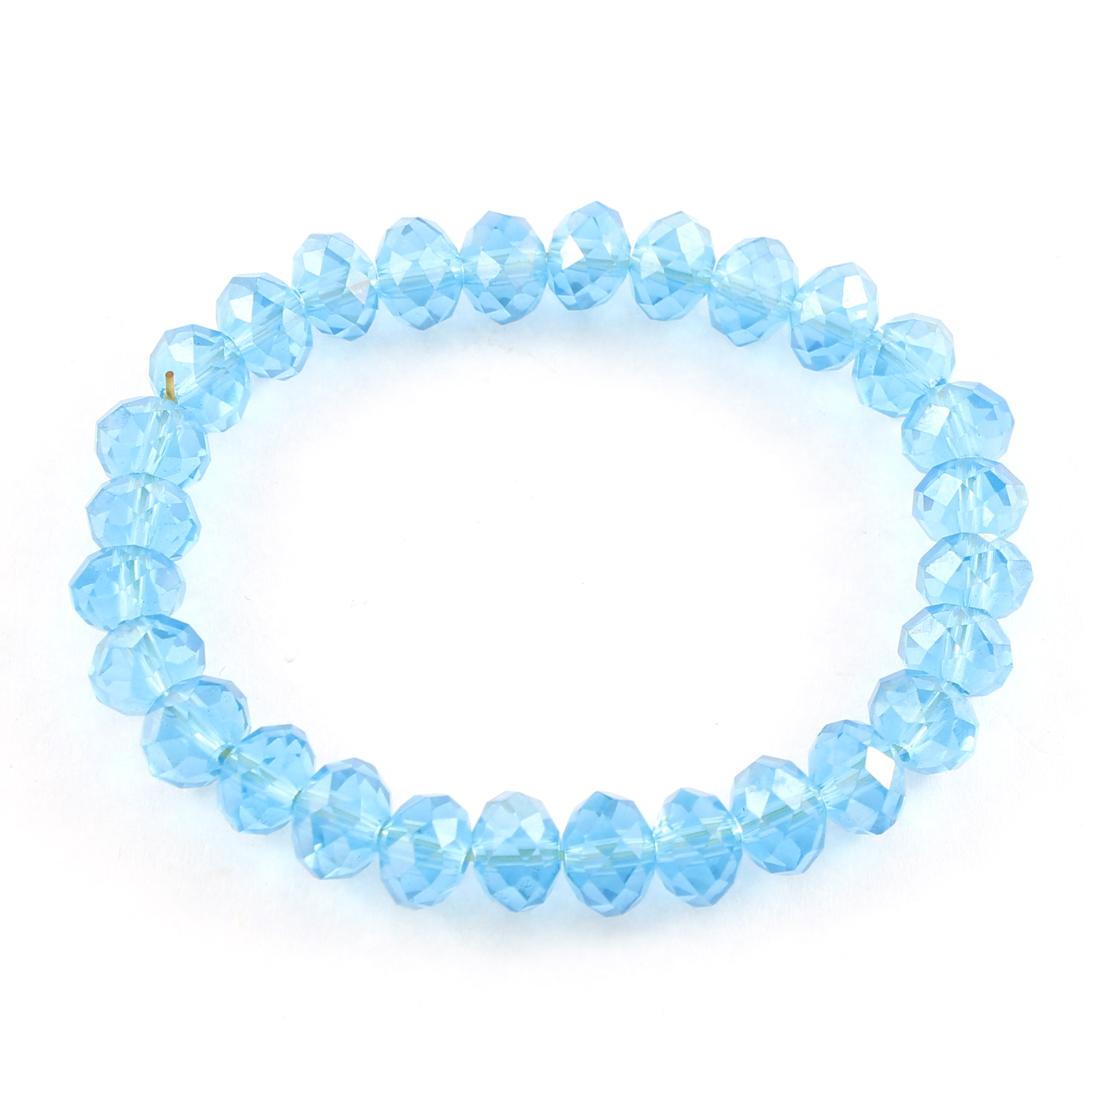 Wedding Party Gift Blue Plastic Crystal Beads Expanding Elastic Wrist Bracelet Bangle